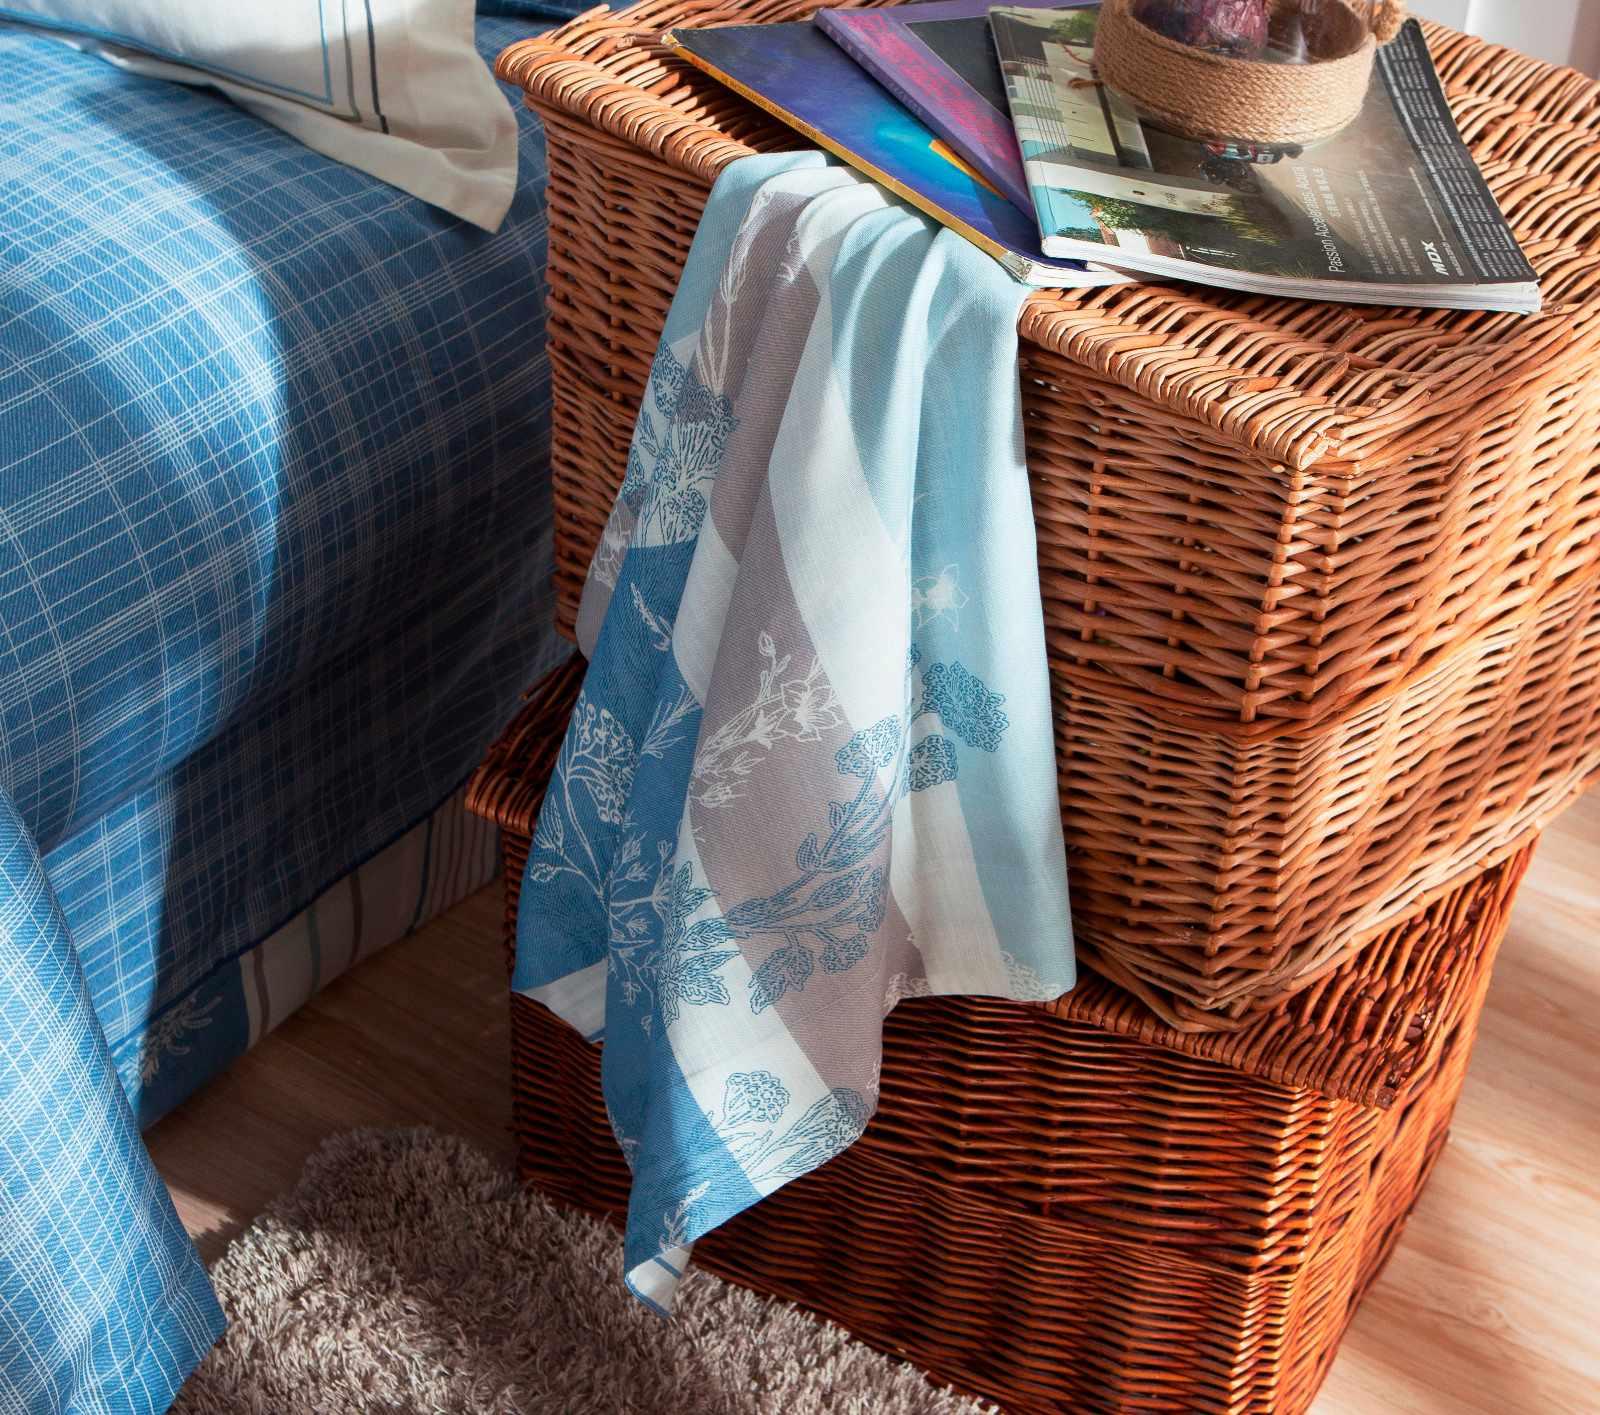 Daphne 45% Cotton 45% Lyocell 10% Linen Blended Elegant Printed Bedroom Set   #6820 Other Material Printed image33